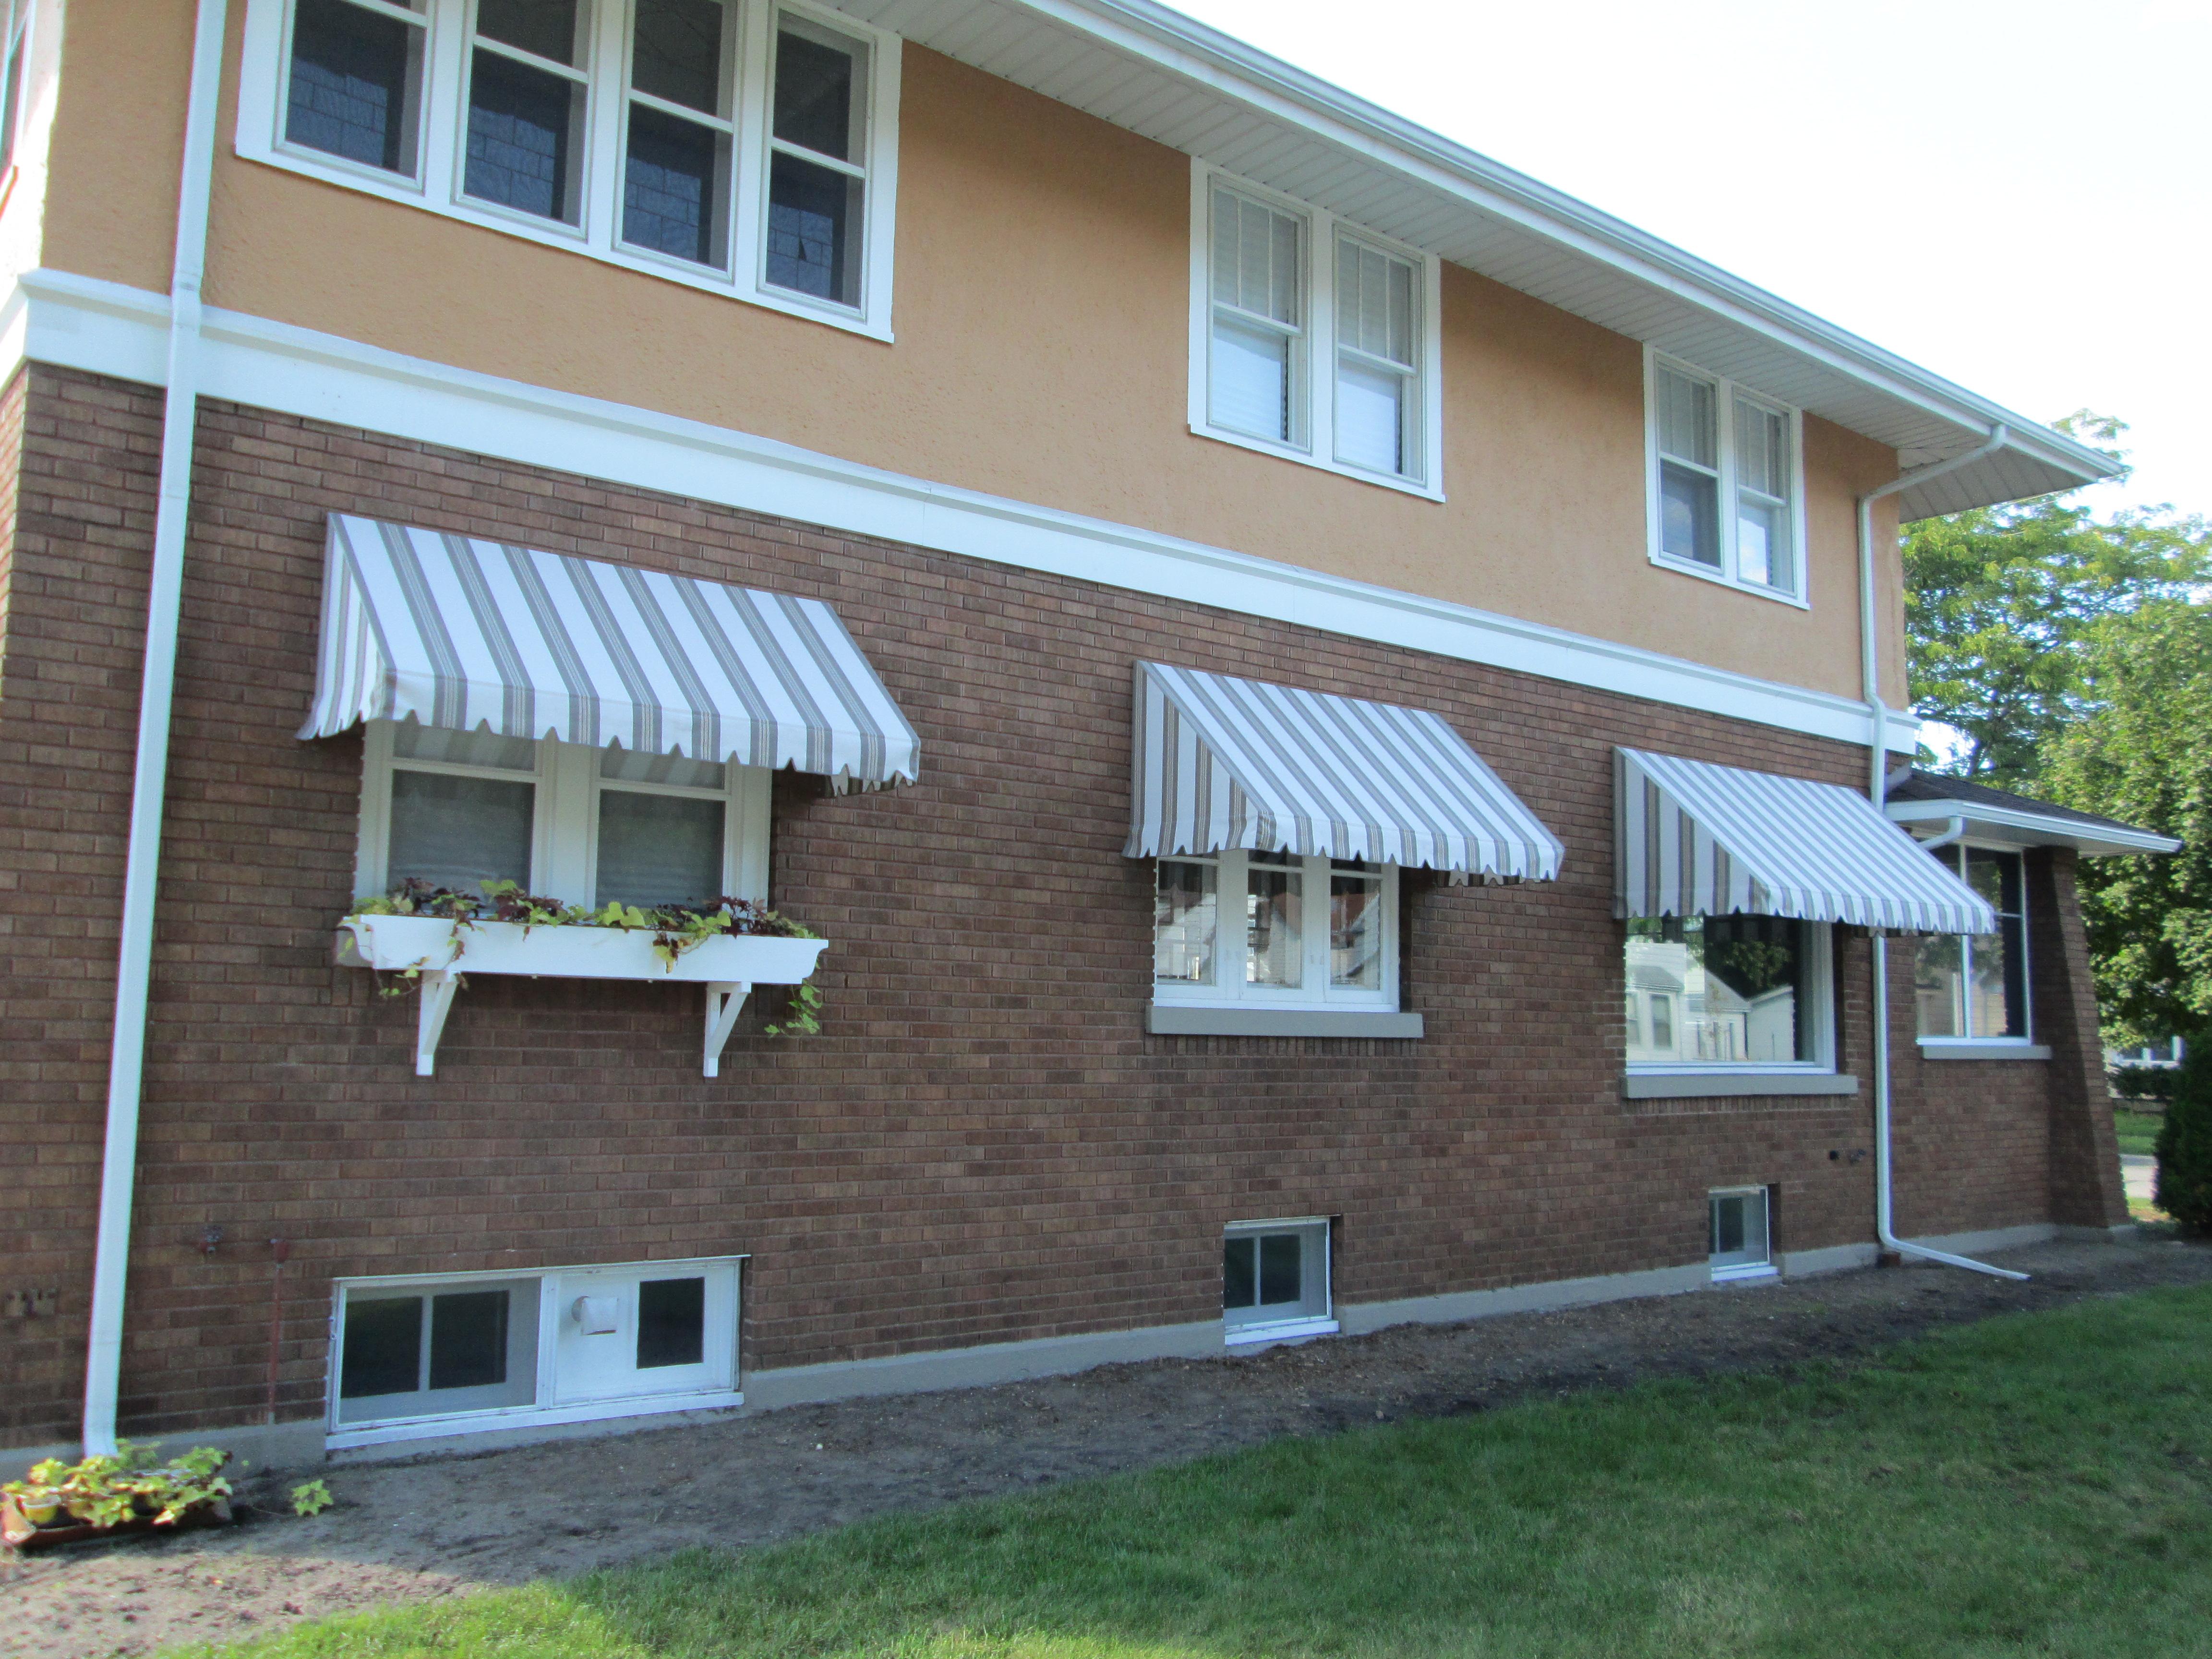 HOME-window-awnings-21 - Muskegon - Awning & Fabrication